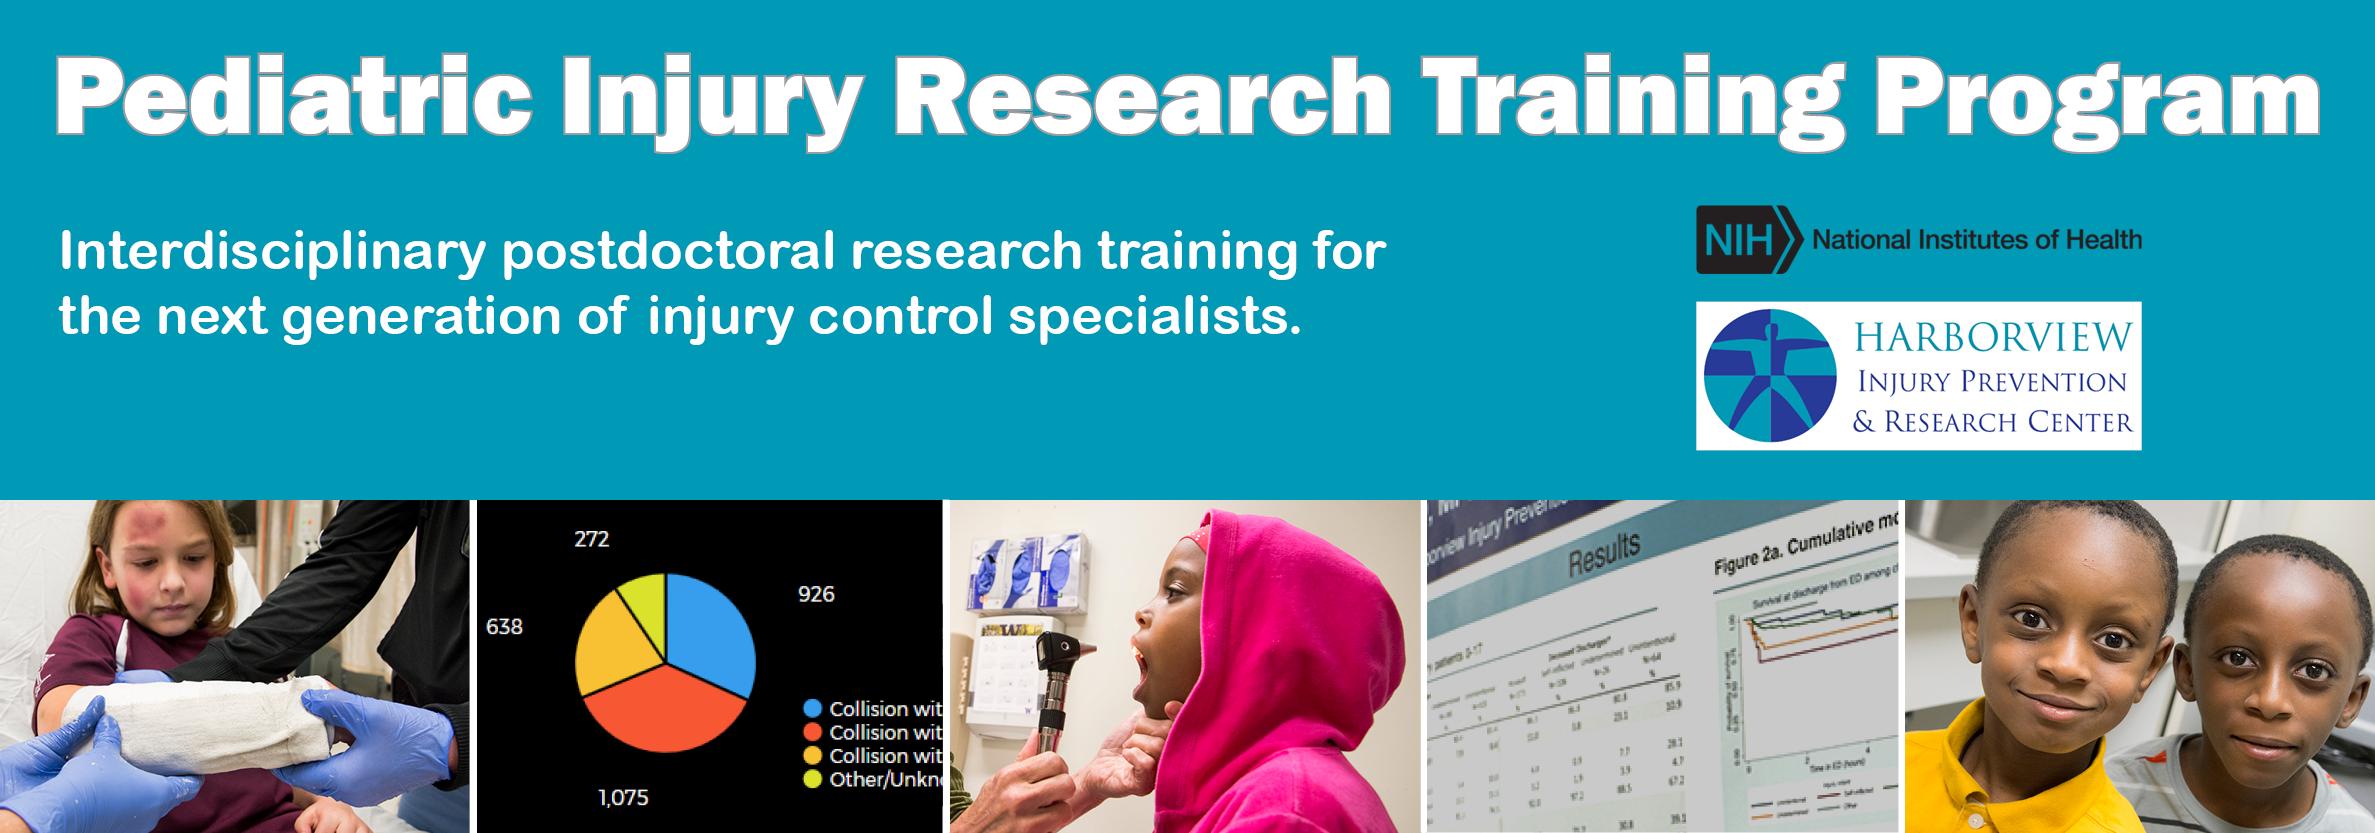 Pediatric Injury Research Training Program (T-32)